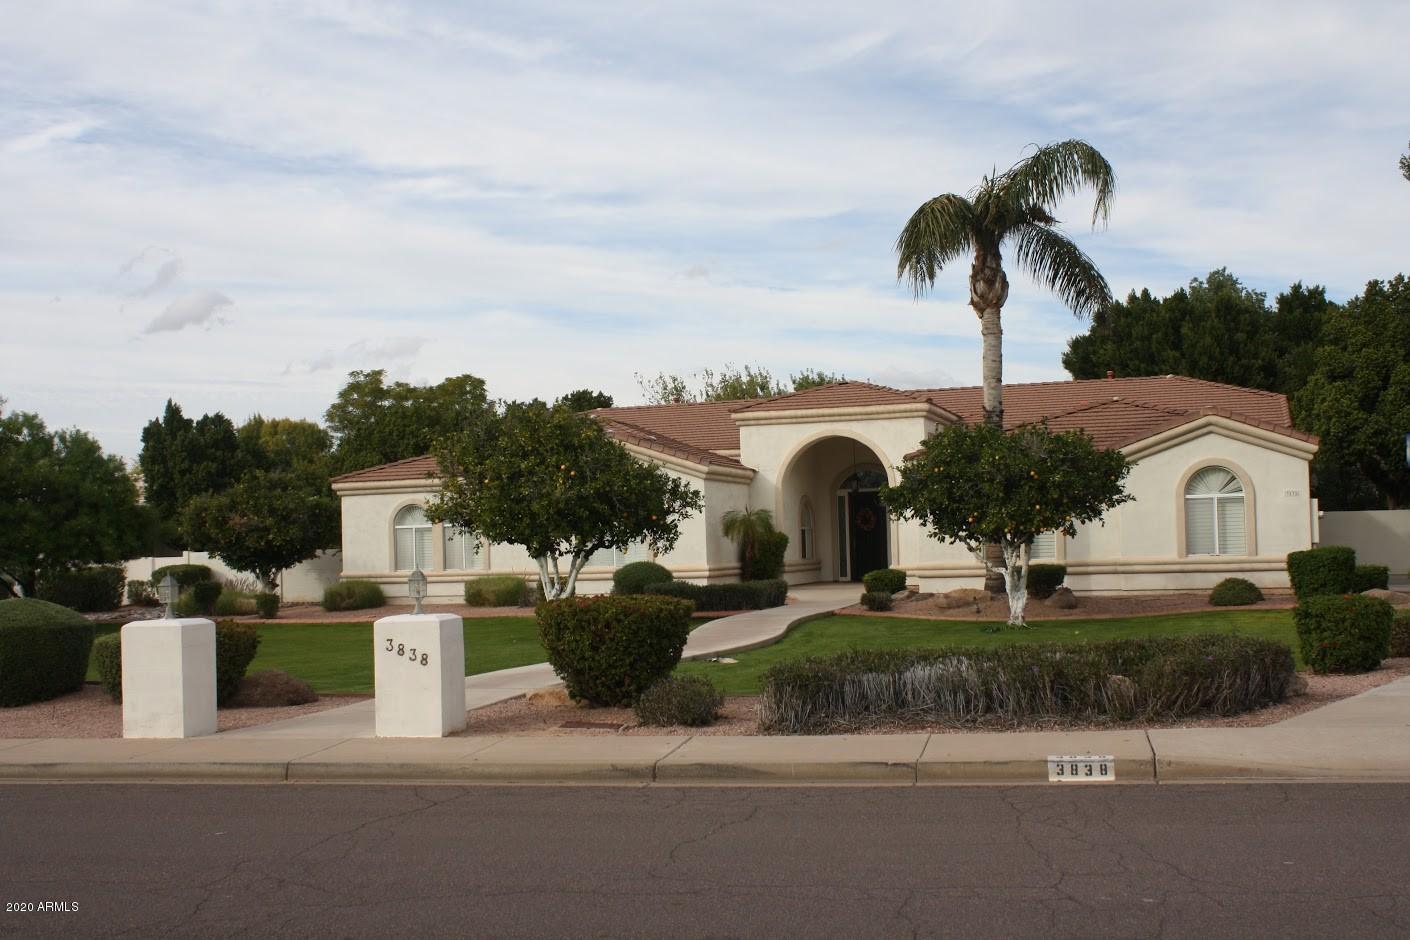 Photo of 3838 E JUNIPER Street, Mesa, AZ 85205